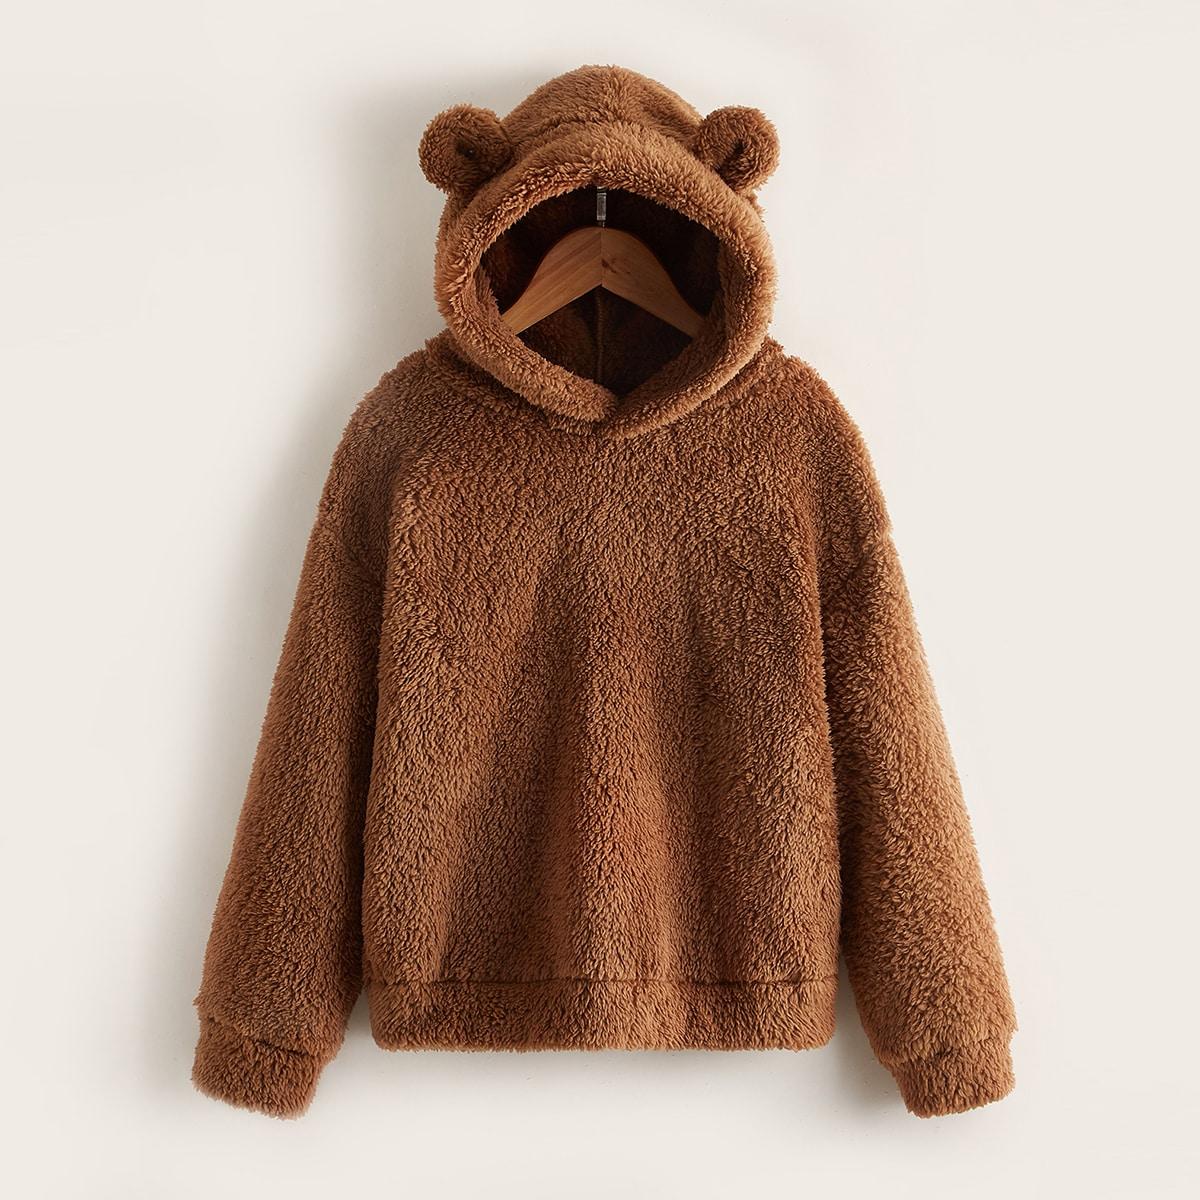 Garçon Sweat-shirt à capuche patch 3D en tissu duveteux